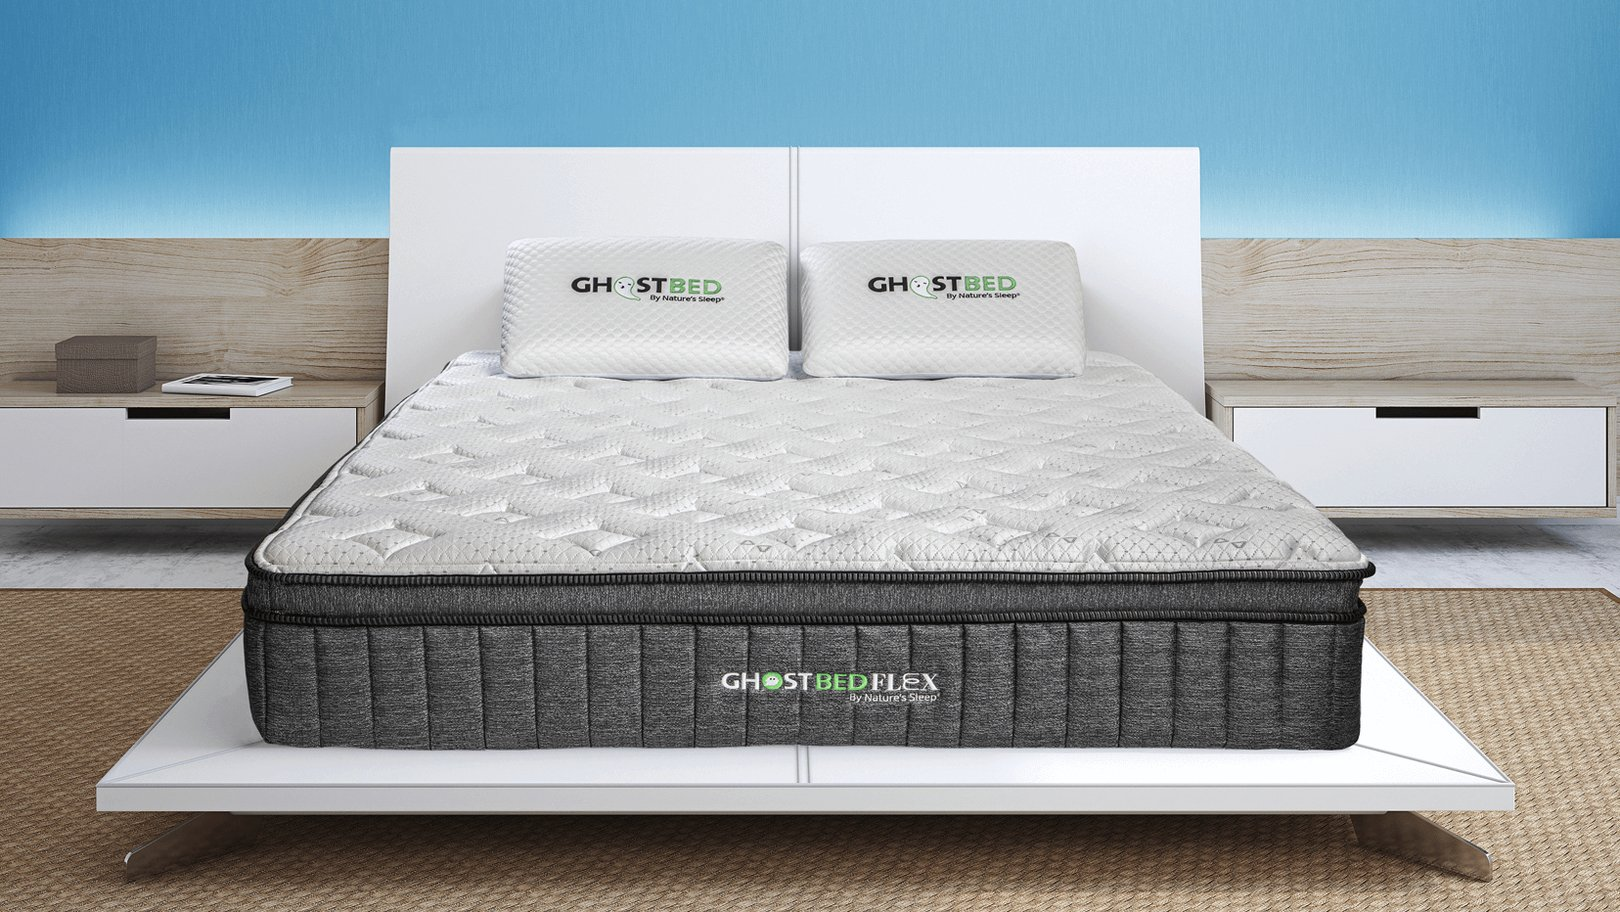 ghostbed flex mattress room setting